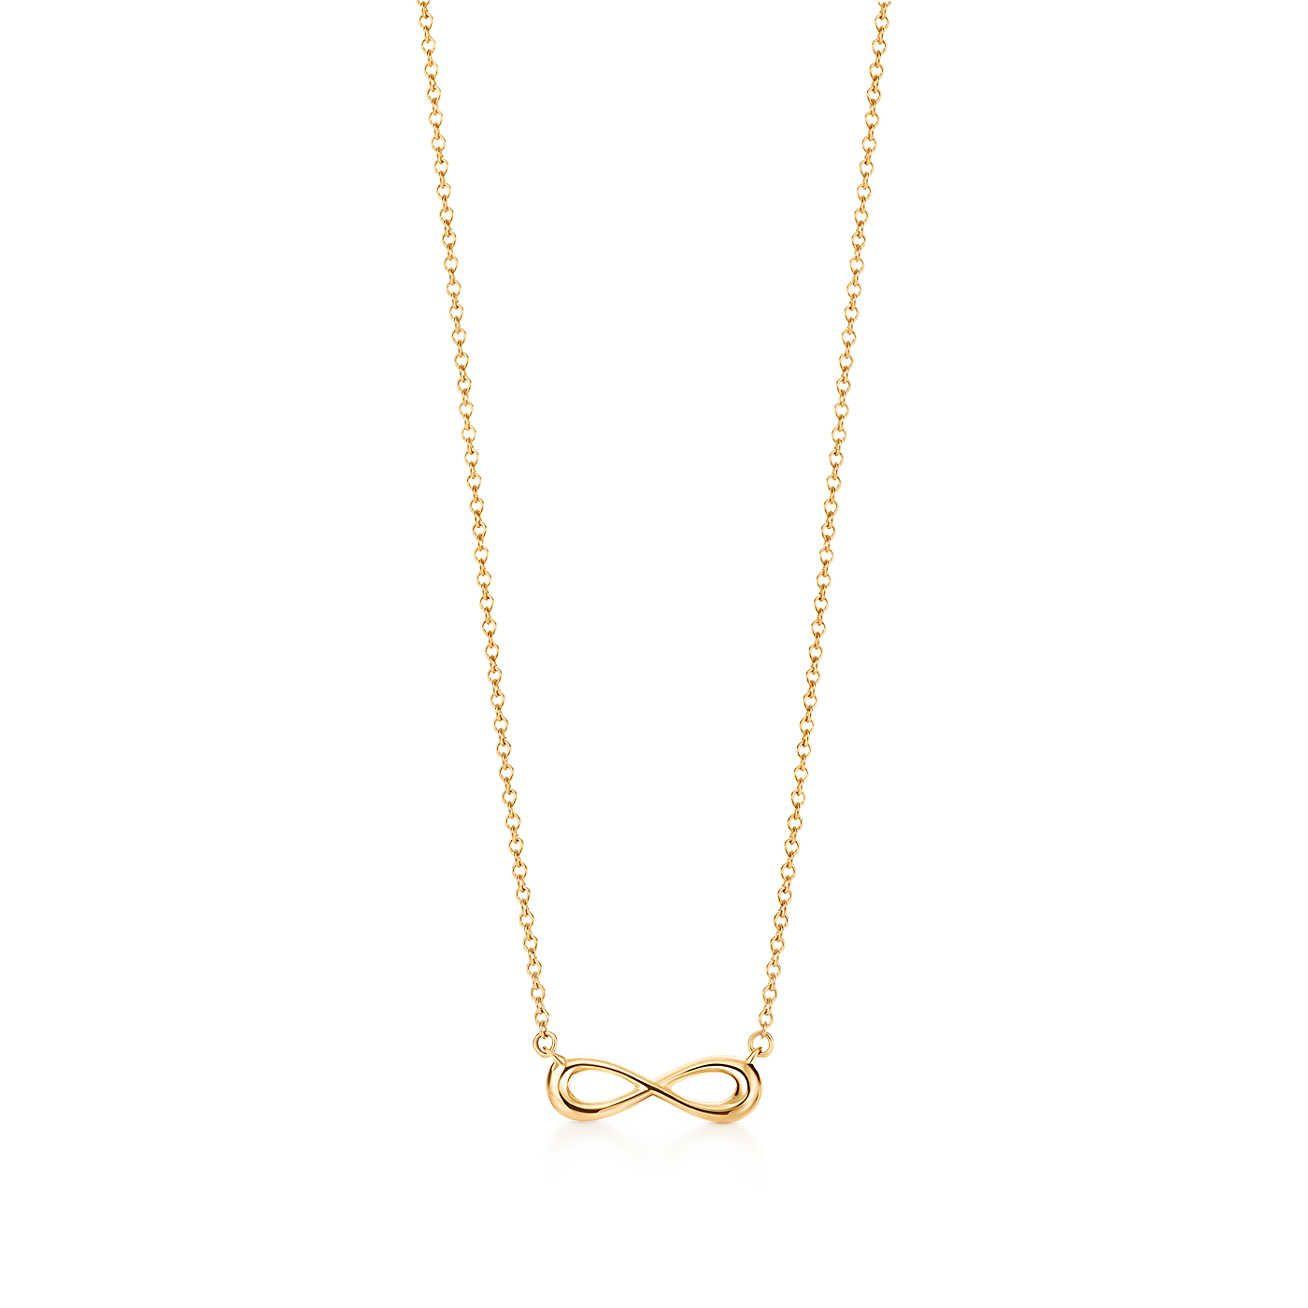 9a3e345b74f0 Tiffany Infinity pendant in 18k gold